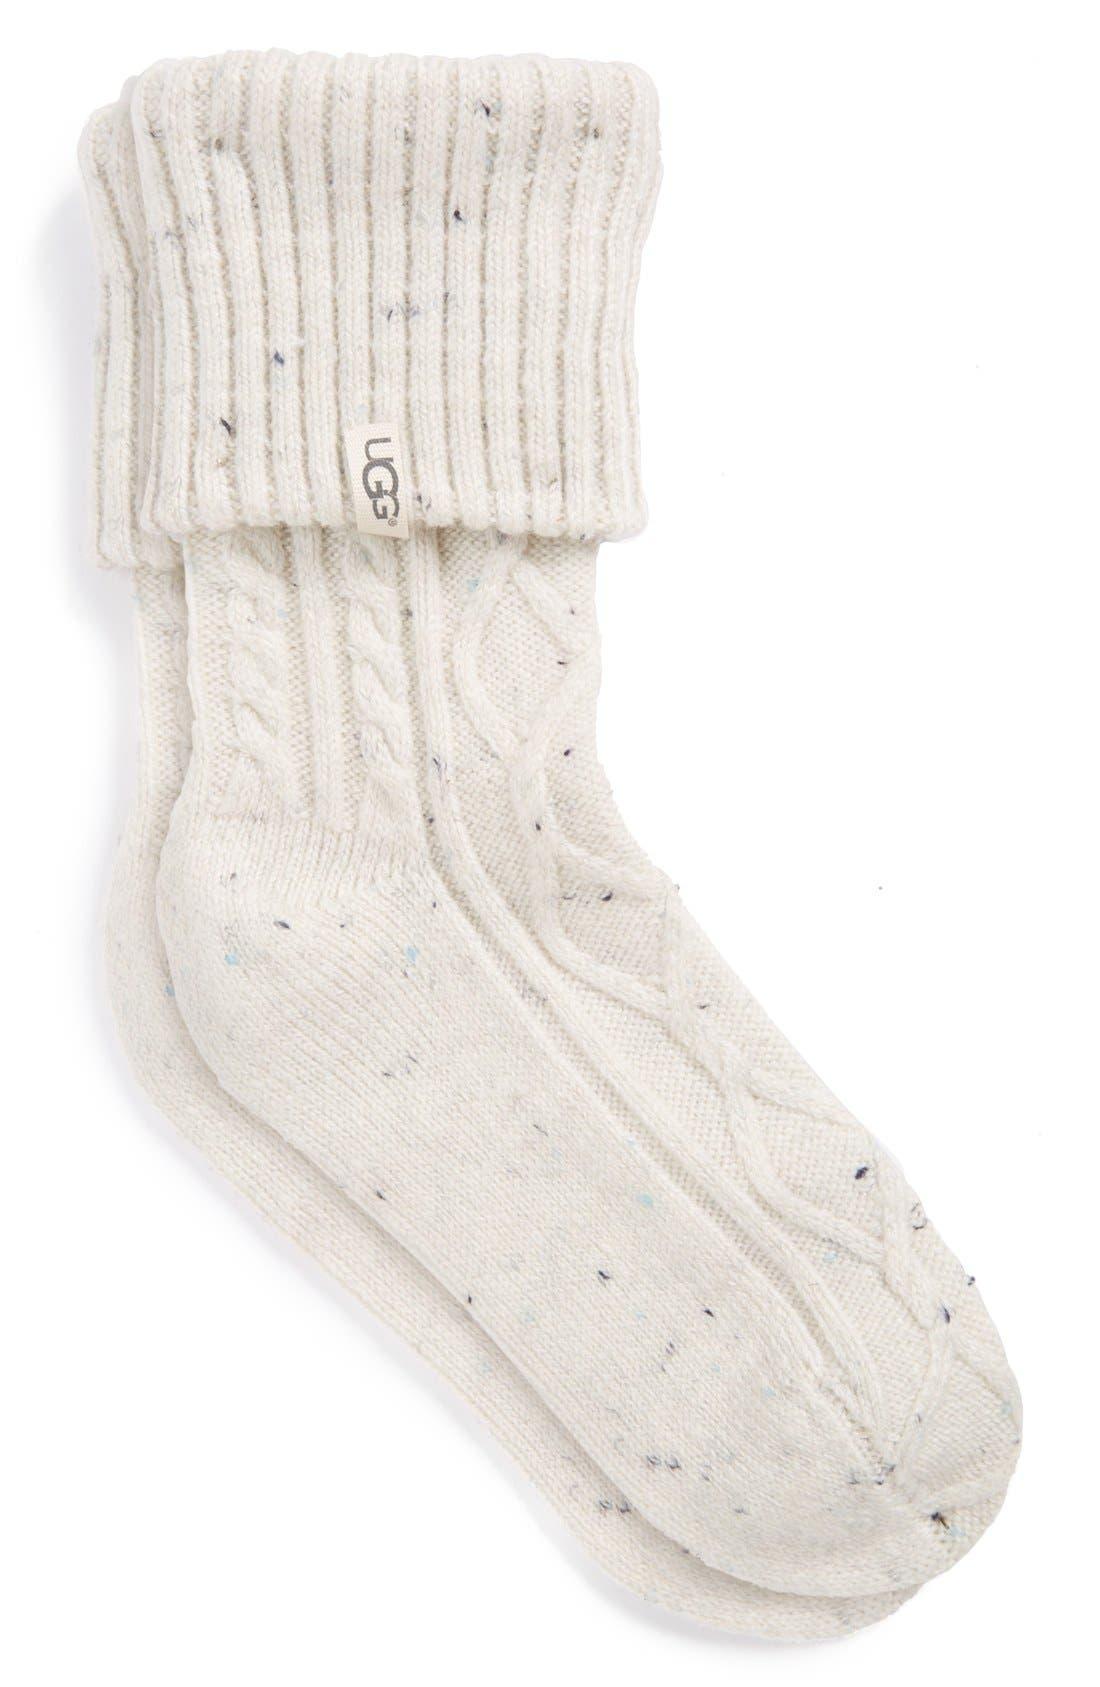 'Sienna' Short Boot Sock,                             Main thumbnail 1, color,                             Freshwater Pearl Fabric